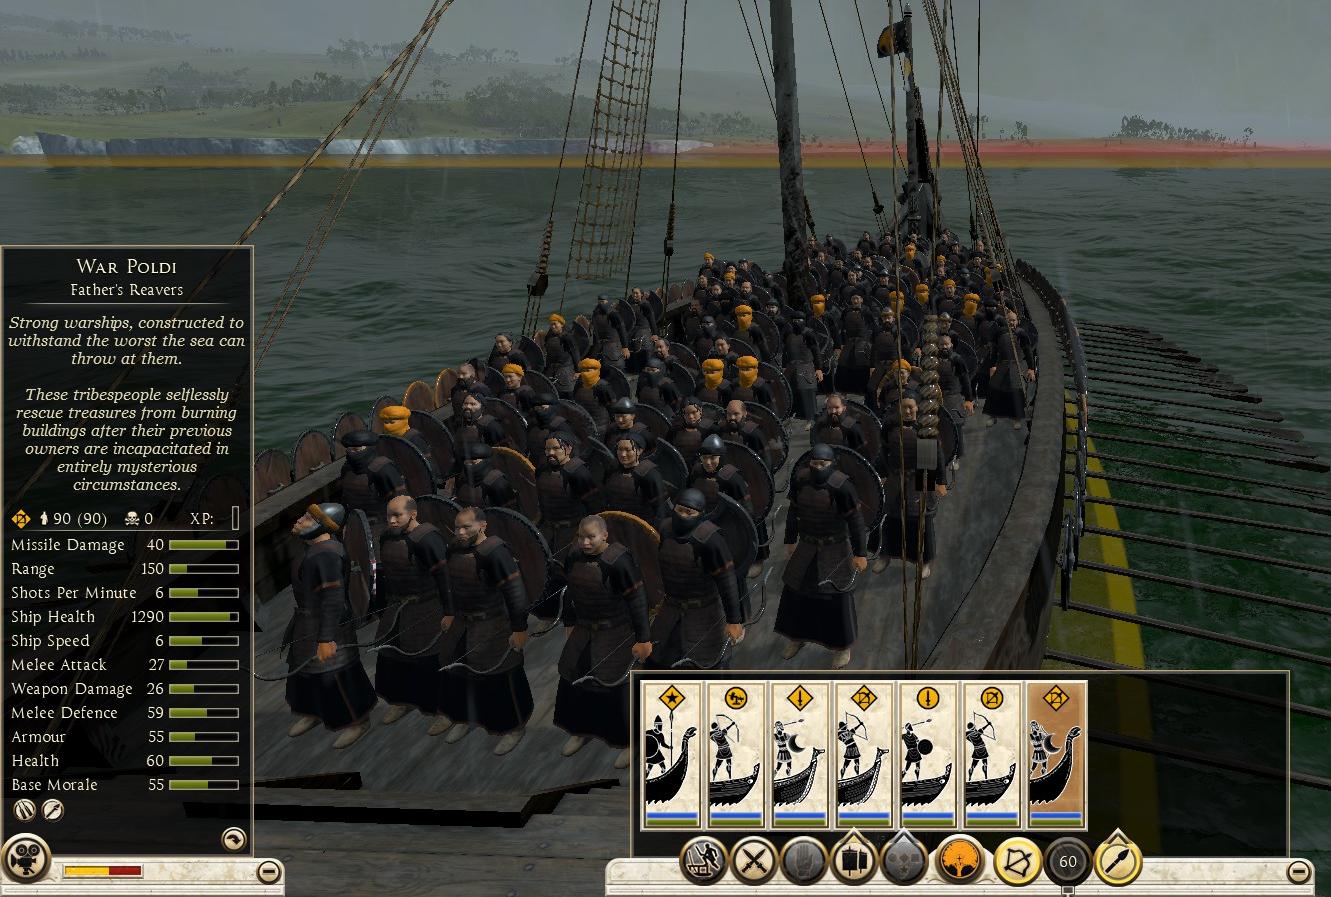 War Poldi, Father's Reavers